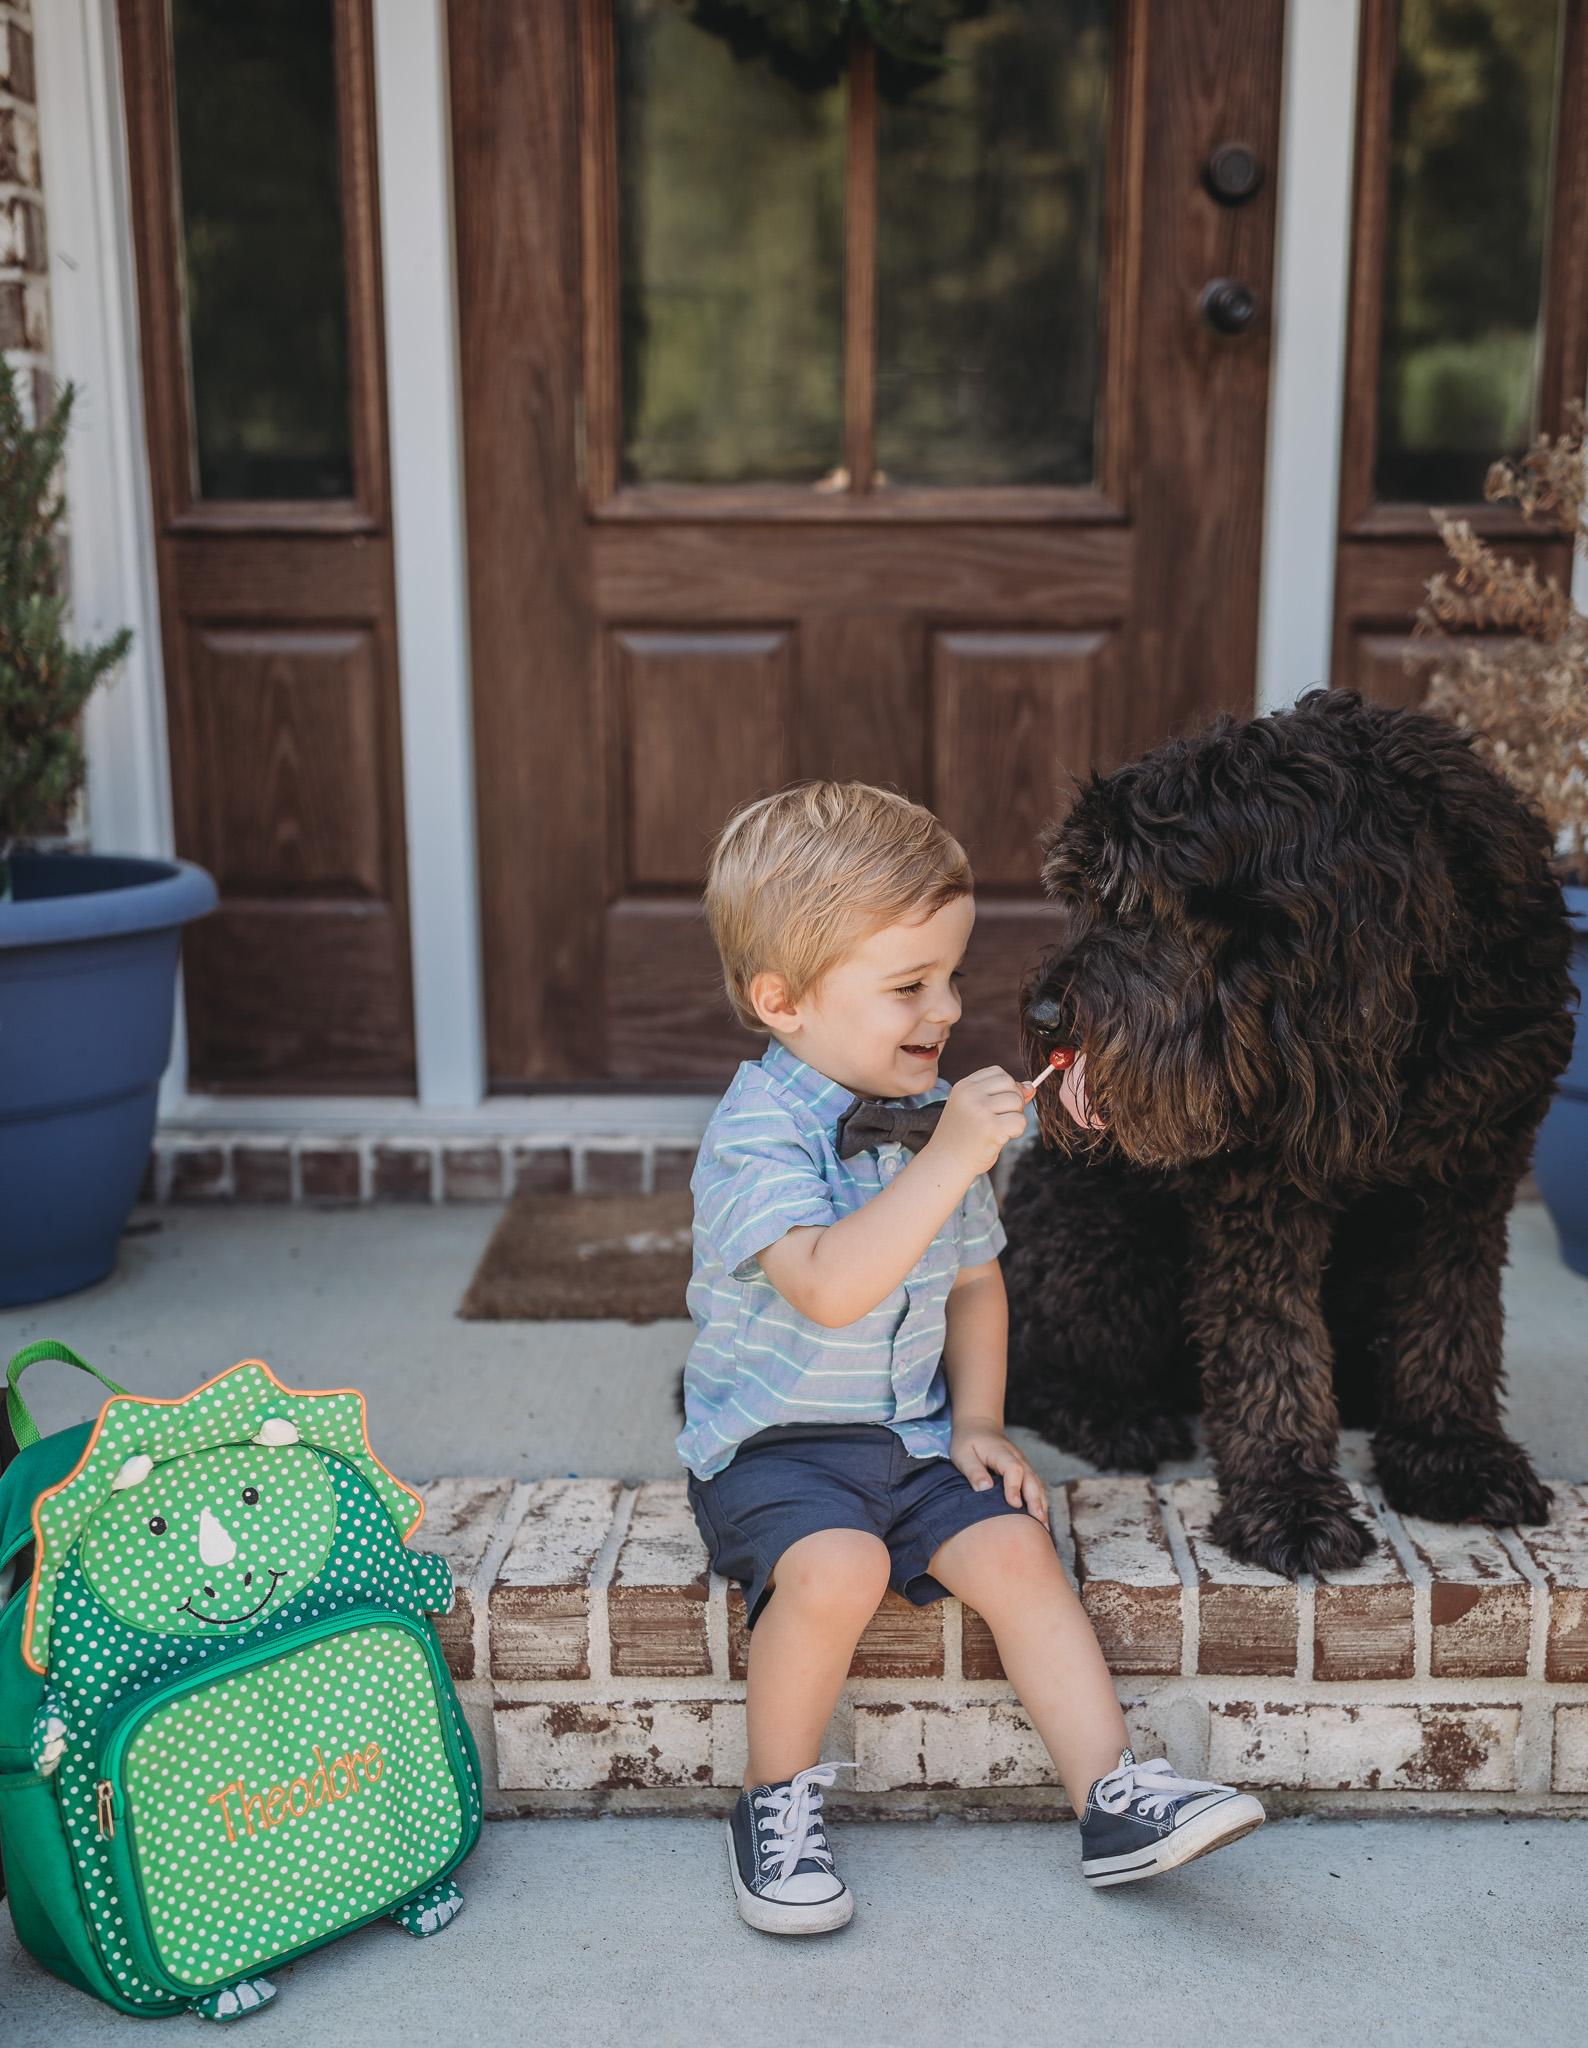 dog wants child snack